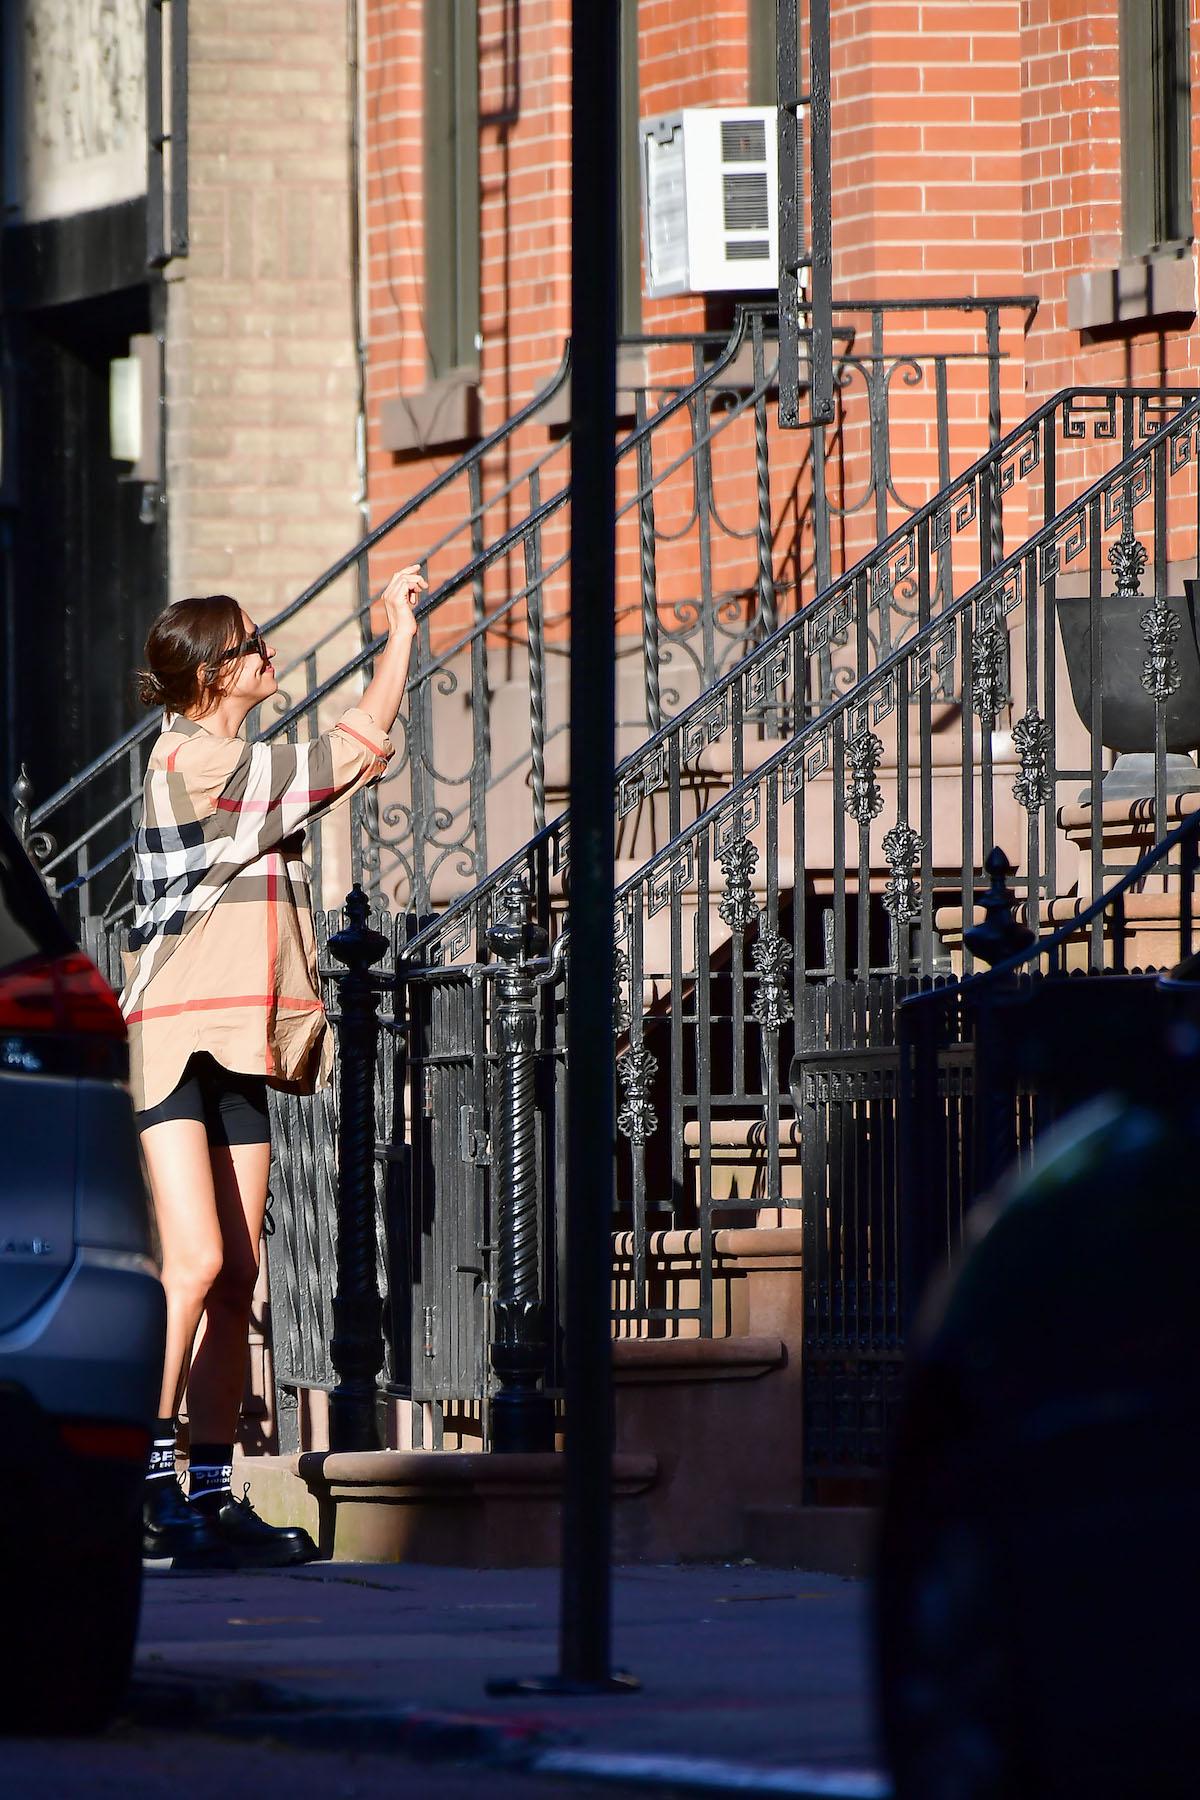 Irina Shayk w domu Bradley Coopera. Forum: Javier Mateo / Eaglepress / Forum